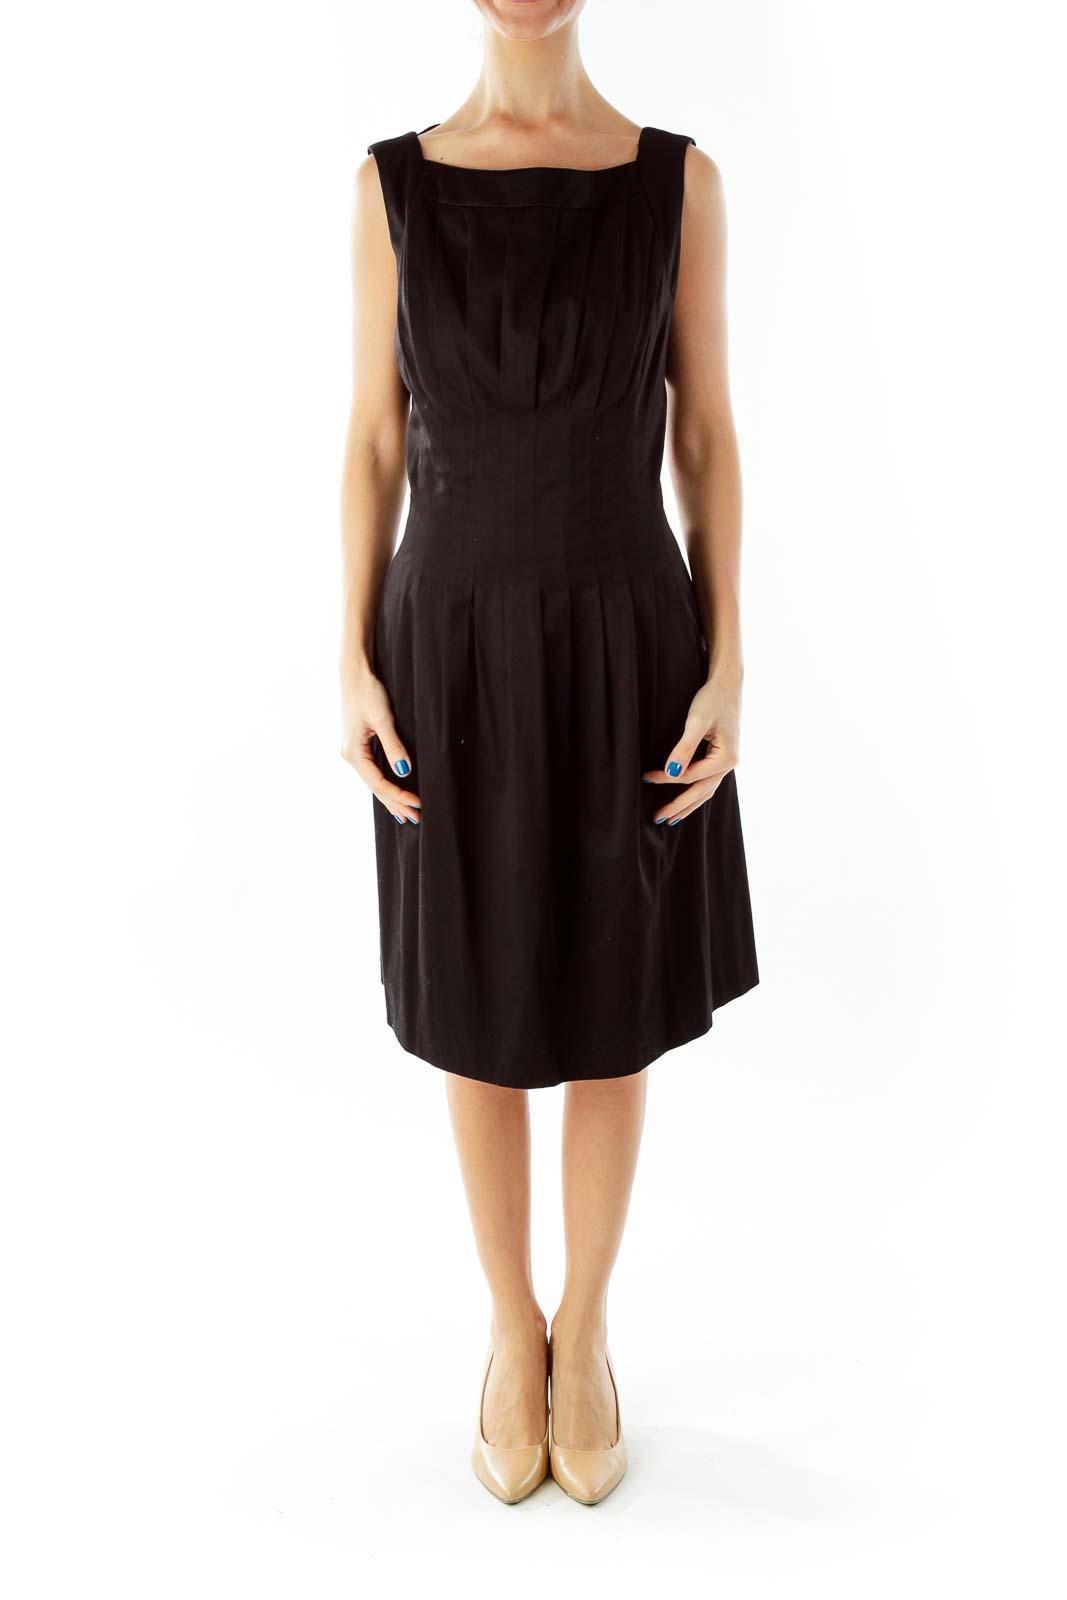 Black Pleated Cocktail Dress